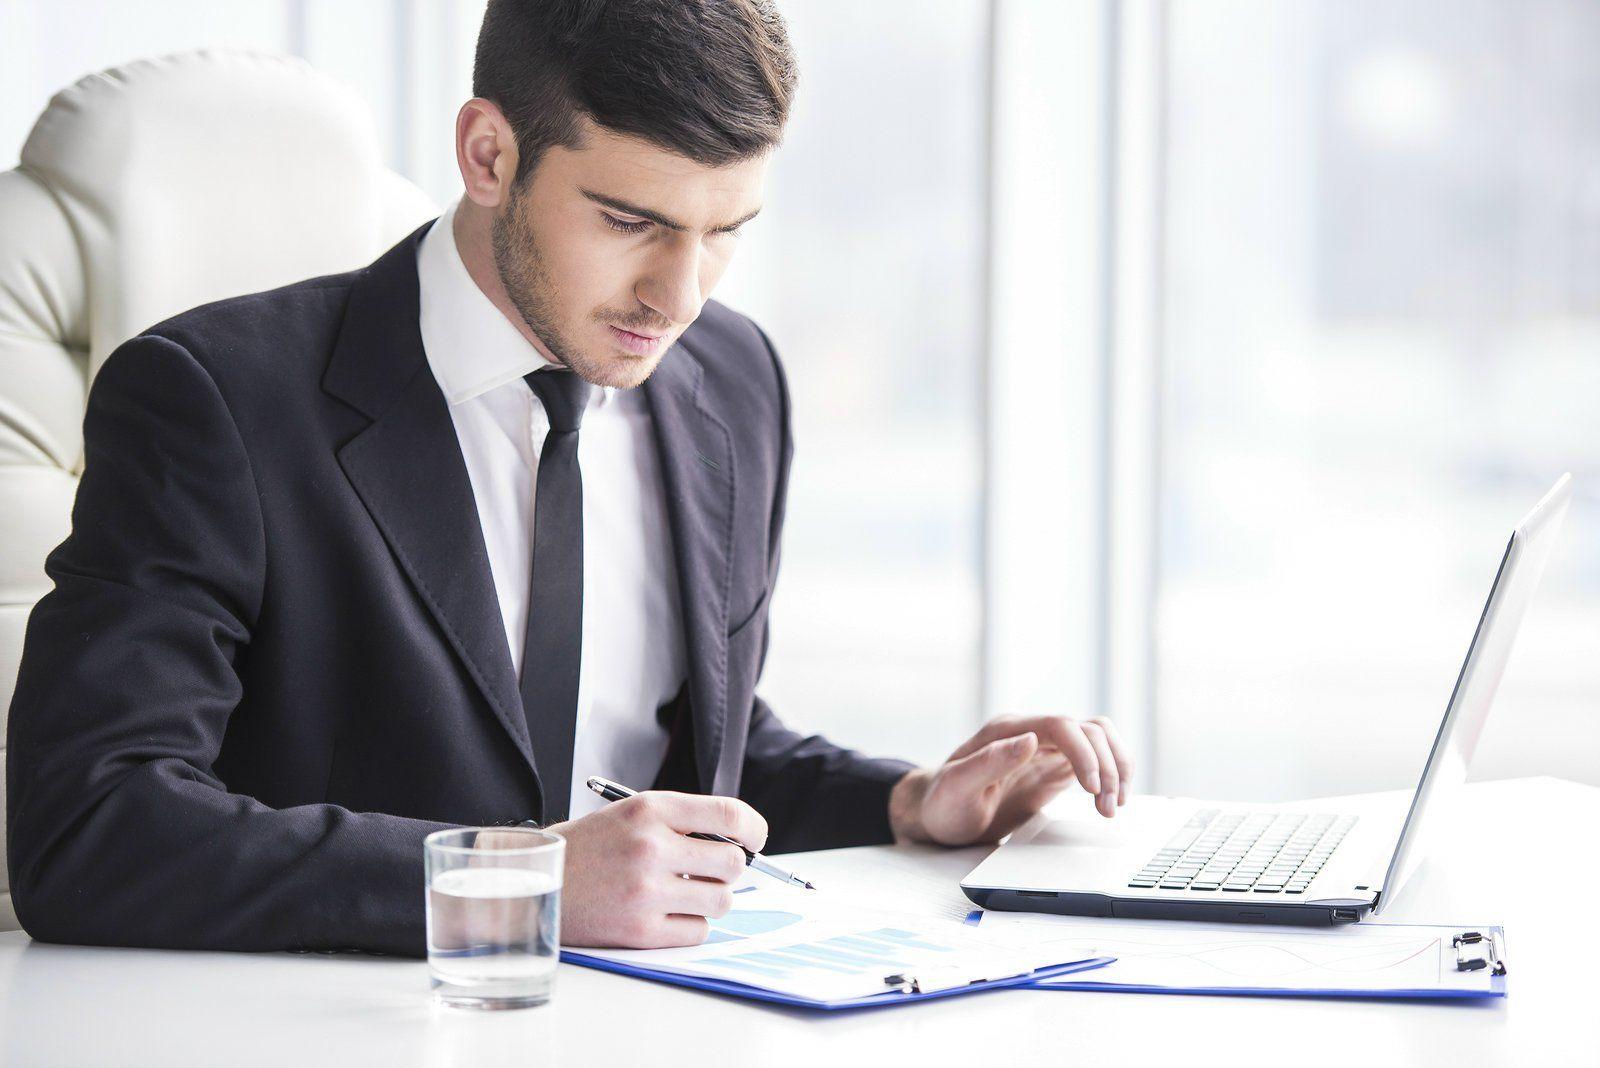 A Look At Digital Marketing Strategies